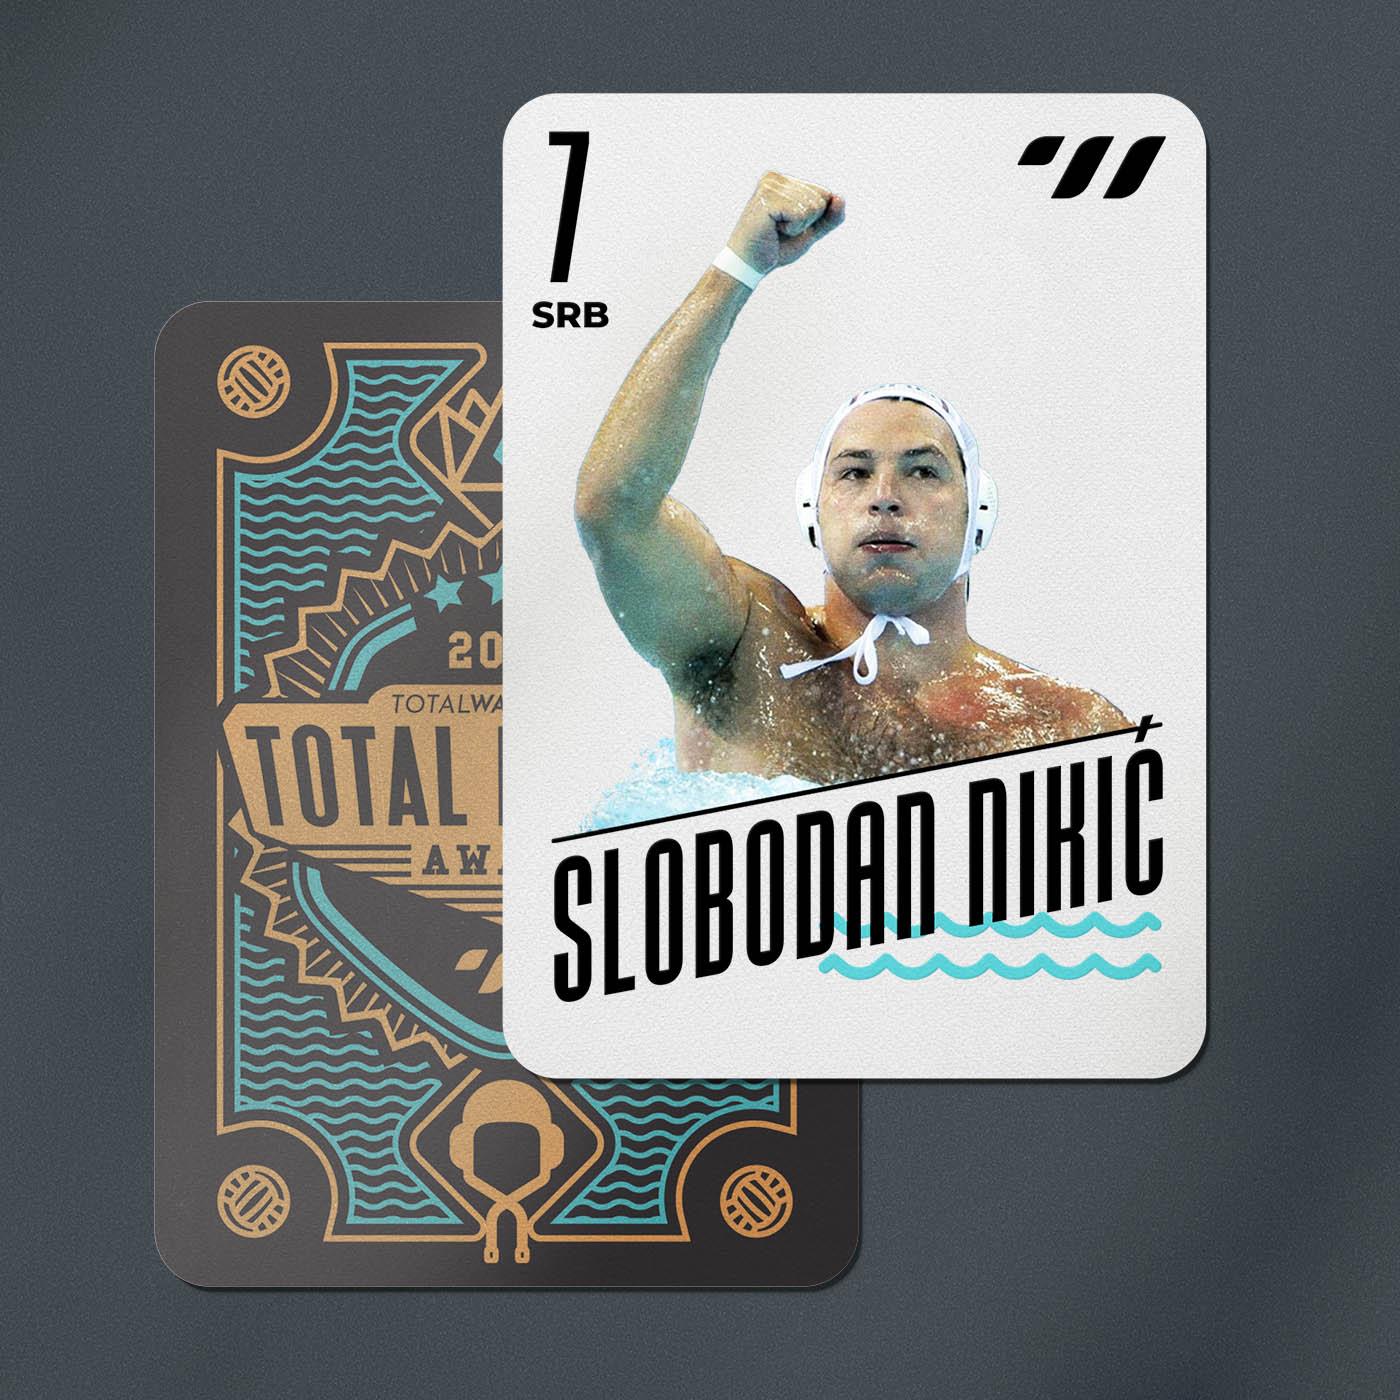 CENTER FORWARD - Slobodan Nikic (SRB)